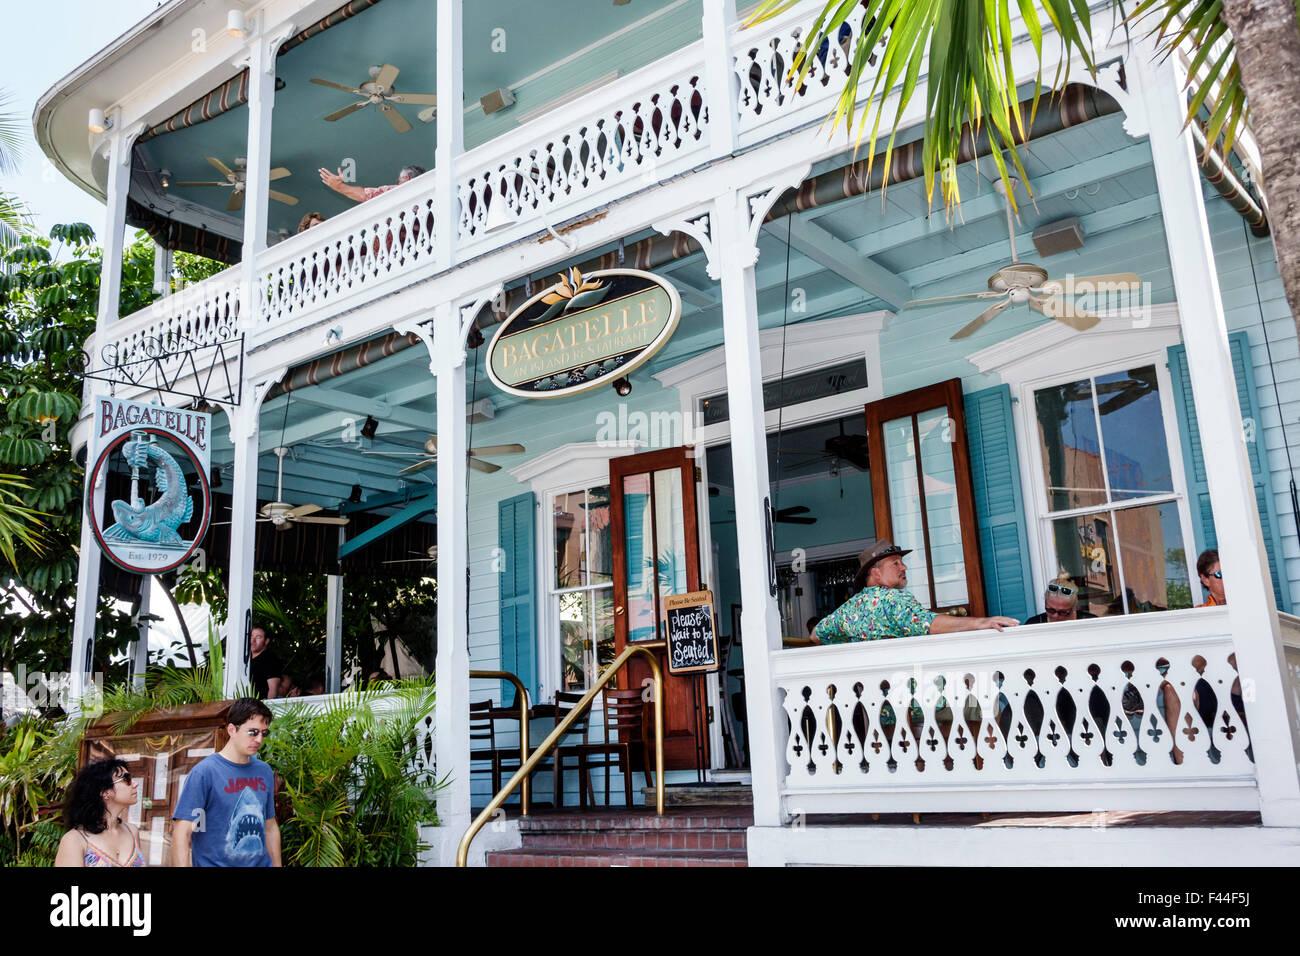 Key West Florida Keys Duval Street Bagatelle restaurant front entrance Stock Photo